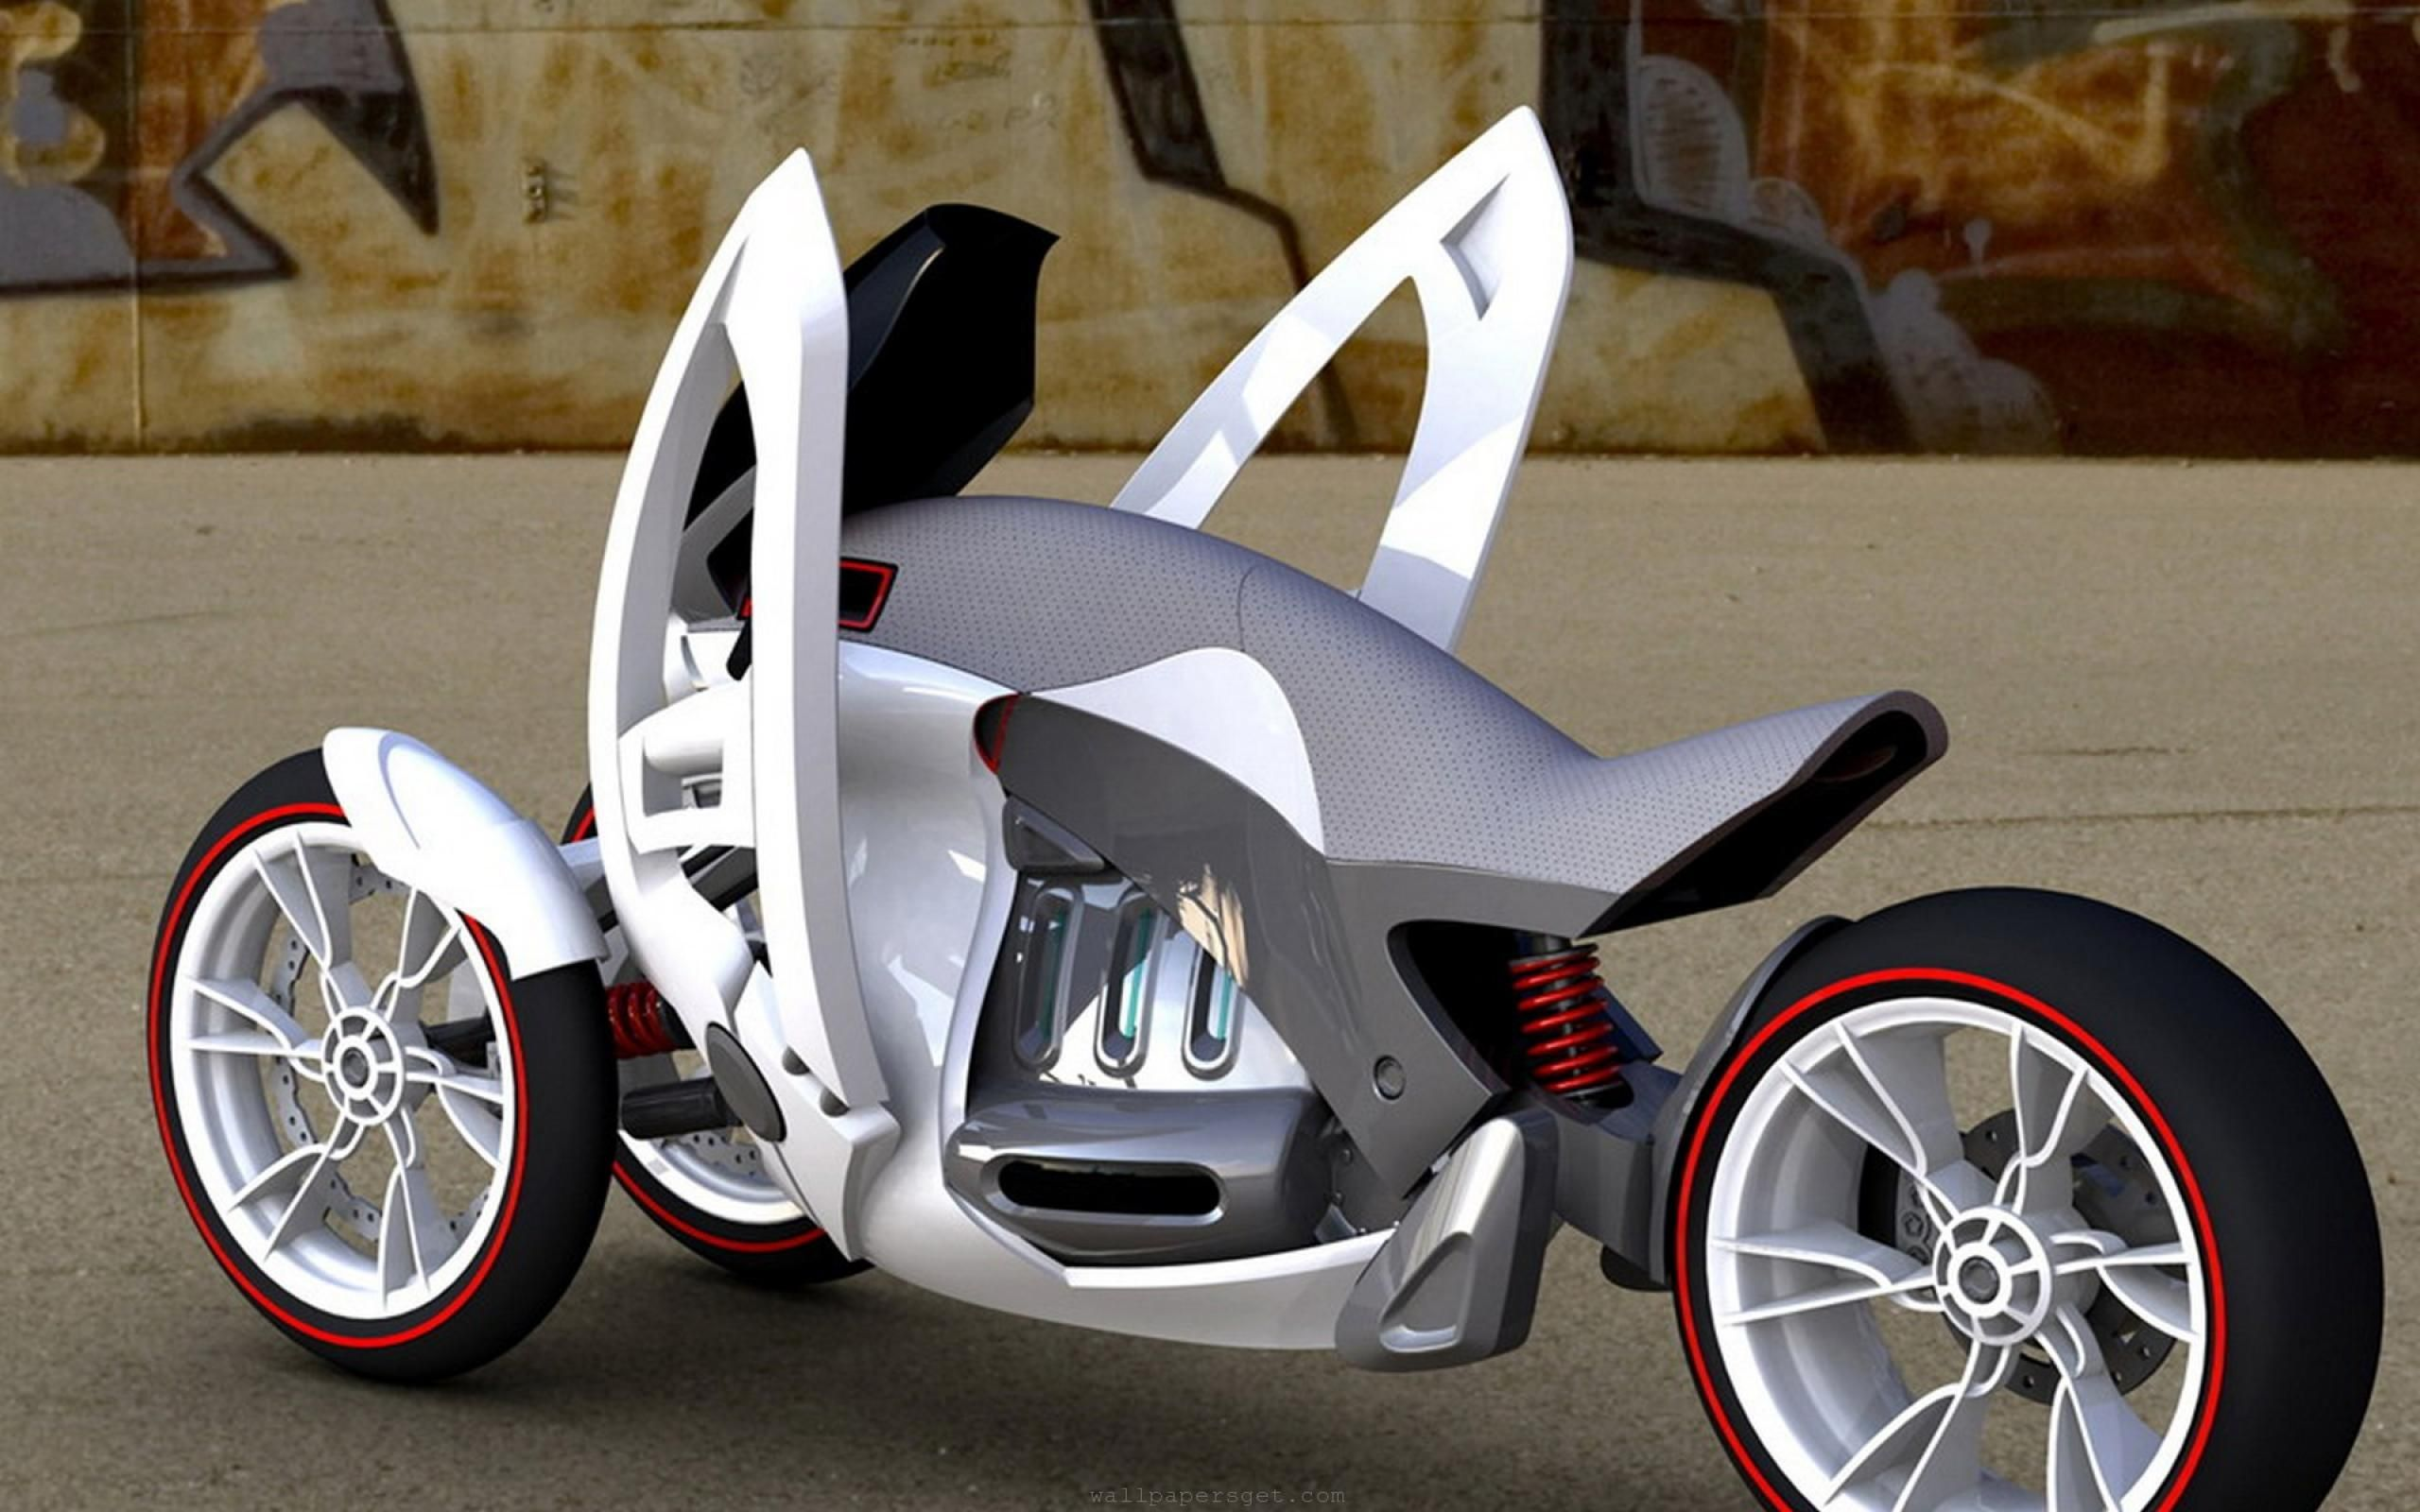 Three Wheel Motorcycle Wallpapers - Top Free Three Wheel